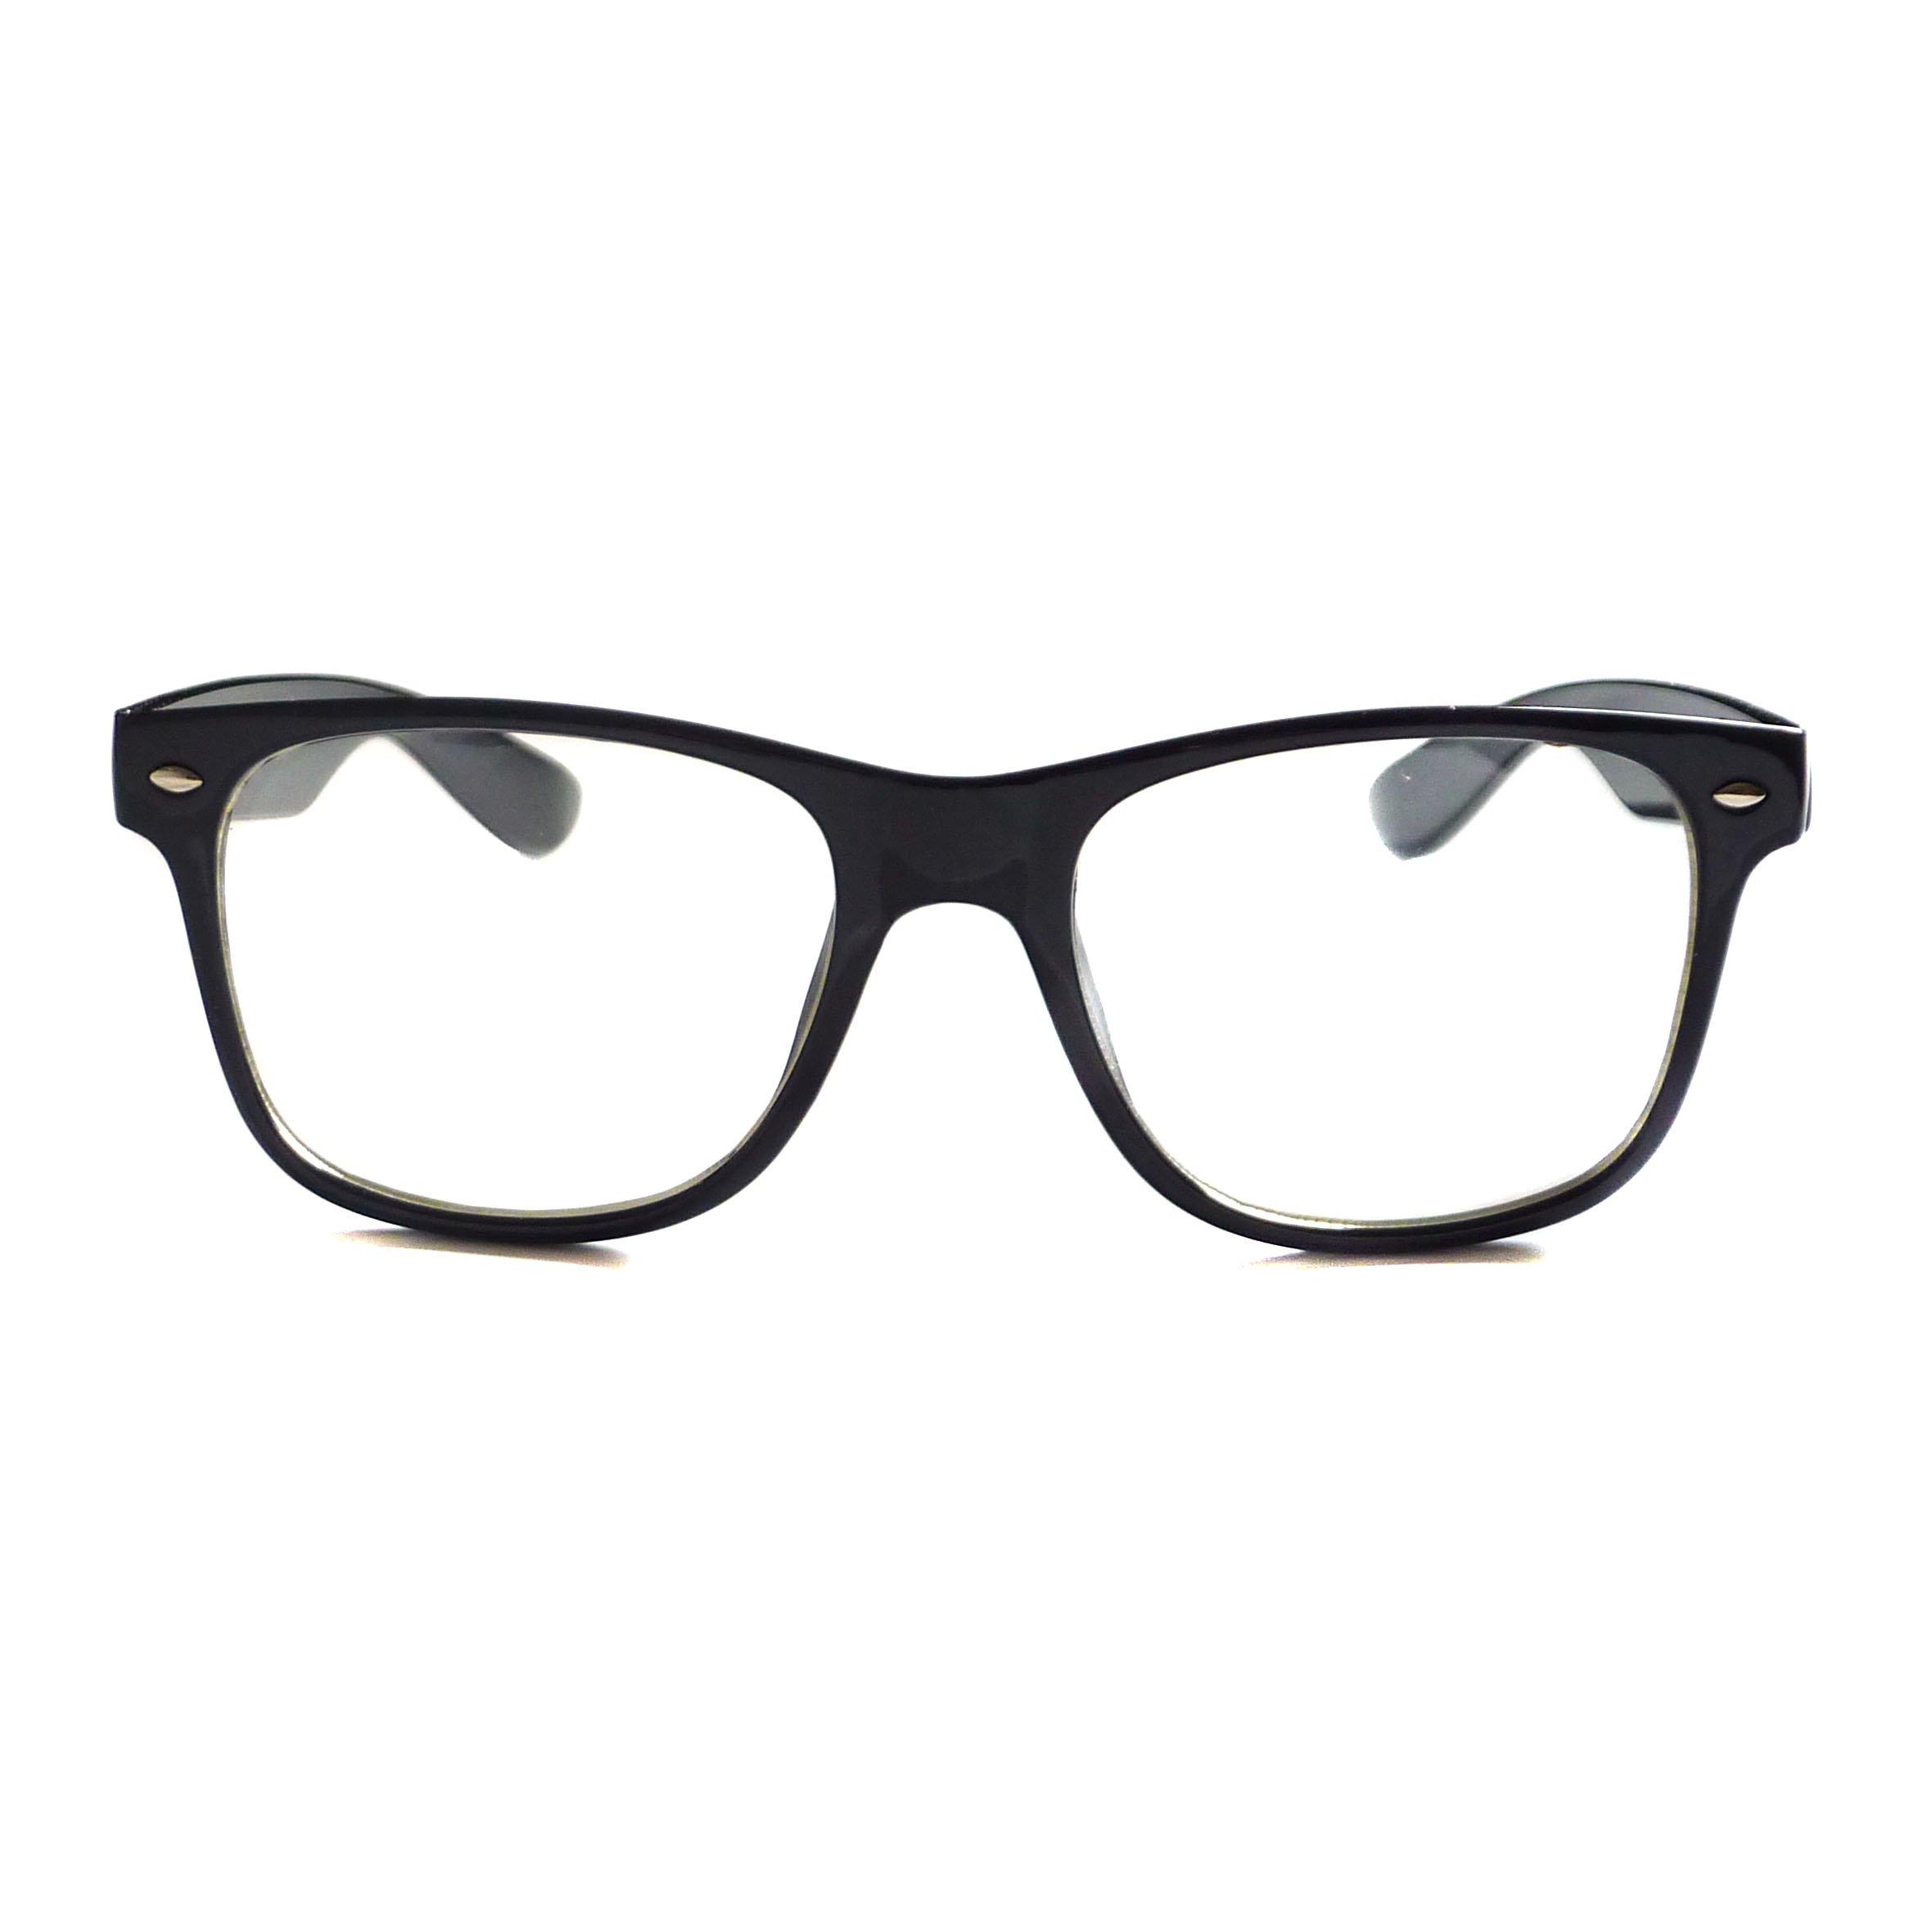 Amazon And Flourescent Light Glasses